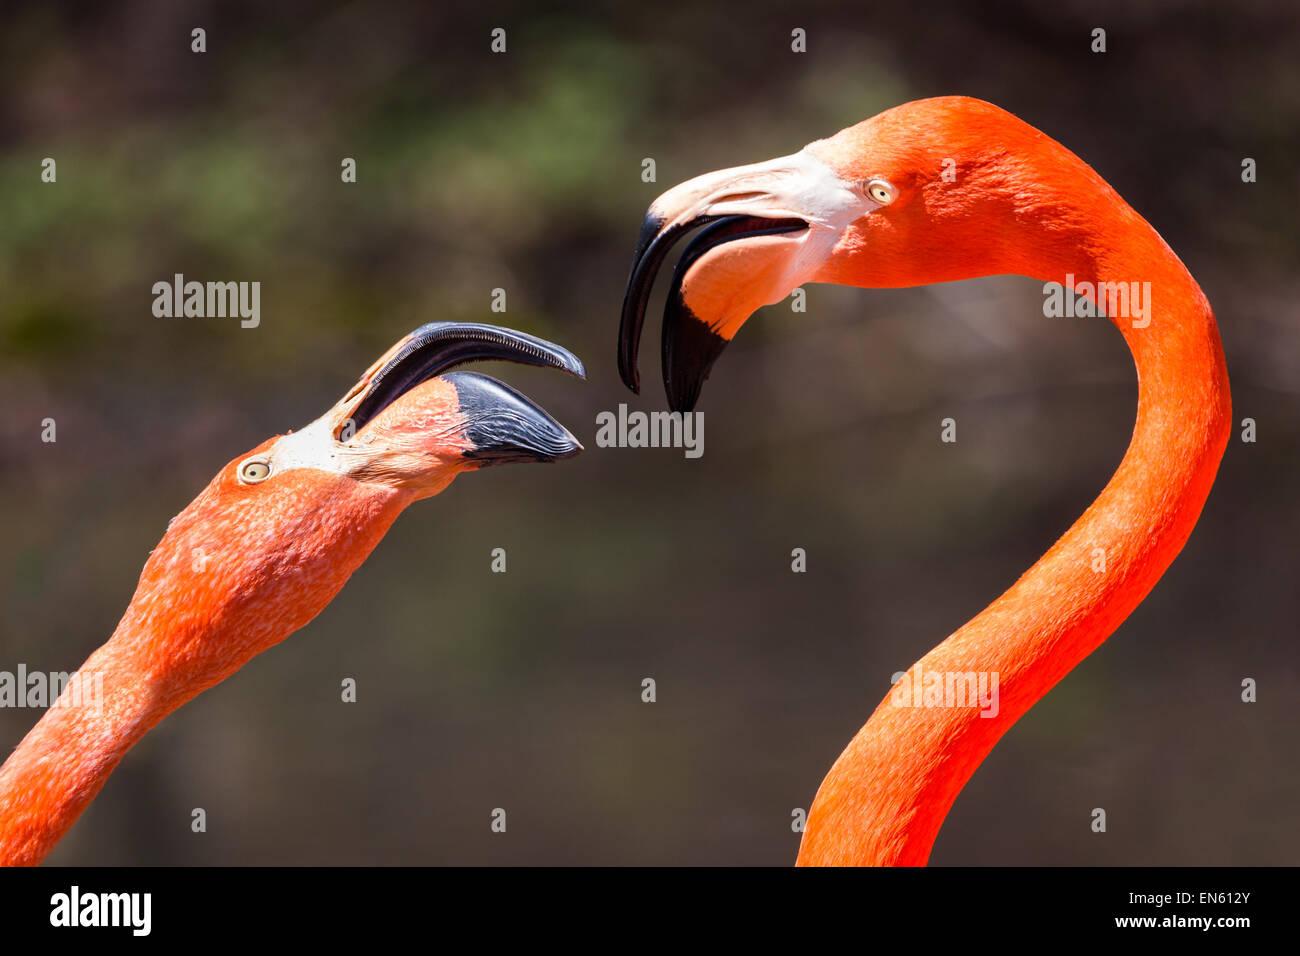 Couple of American Flamingos fighting. - Stock Image